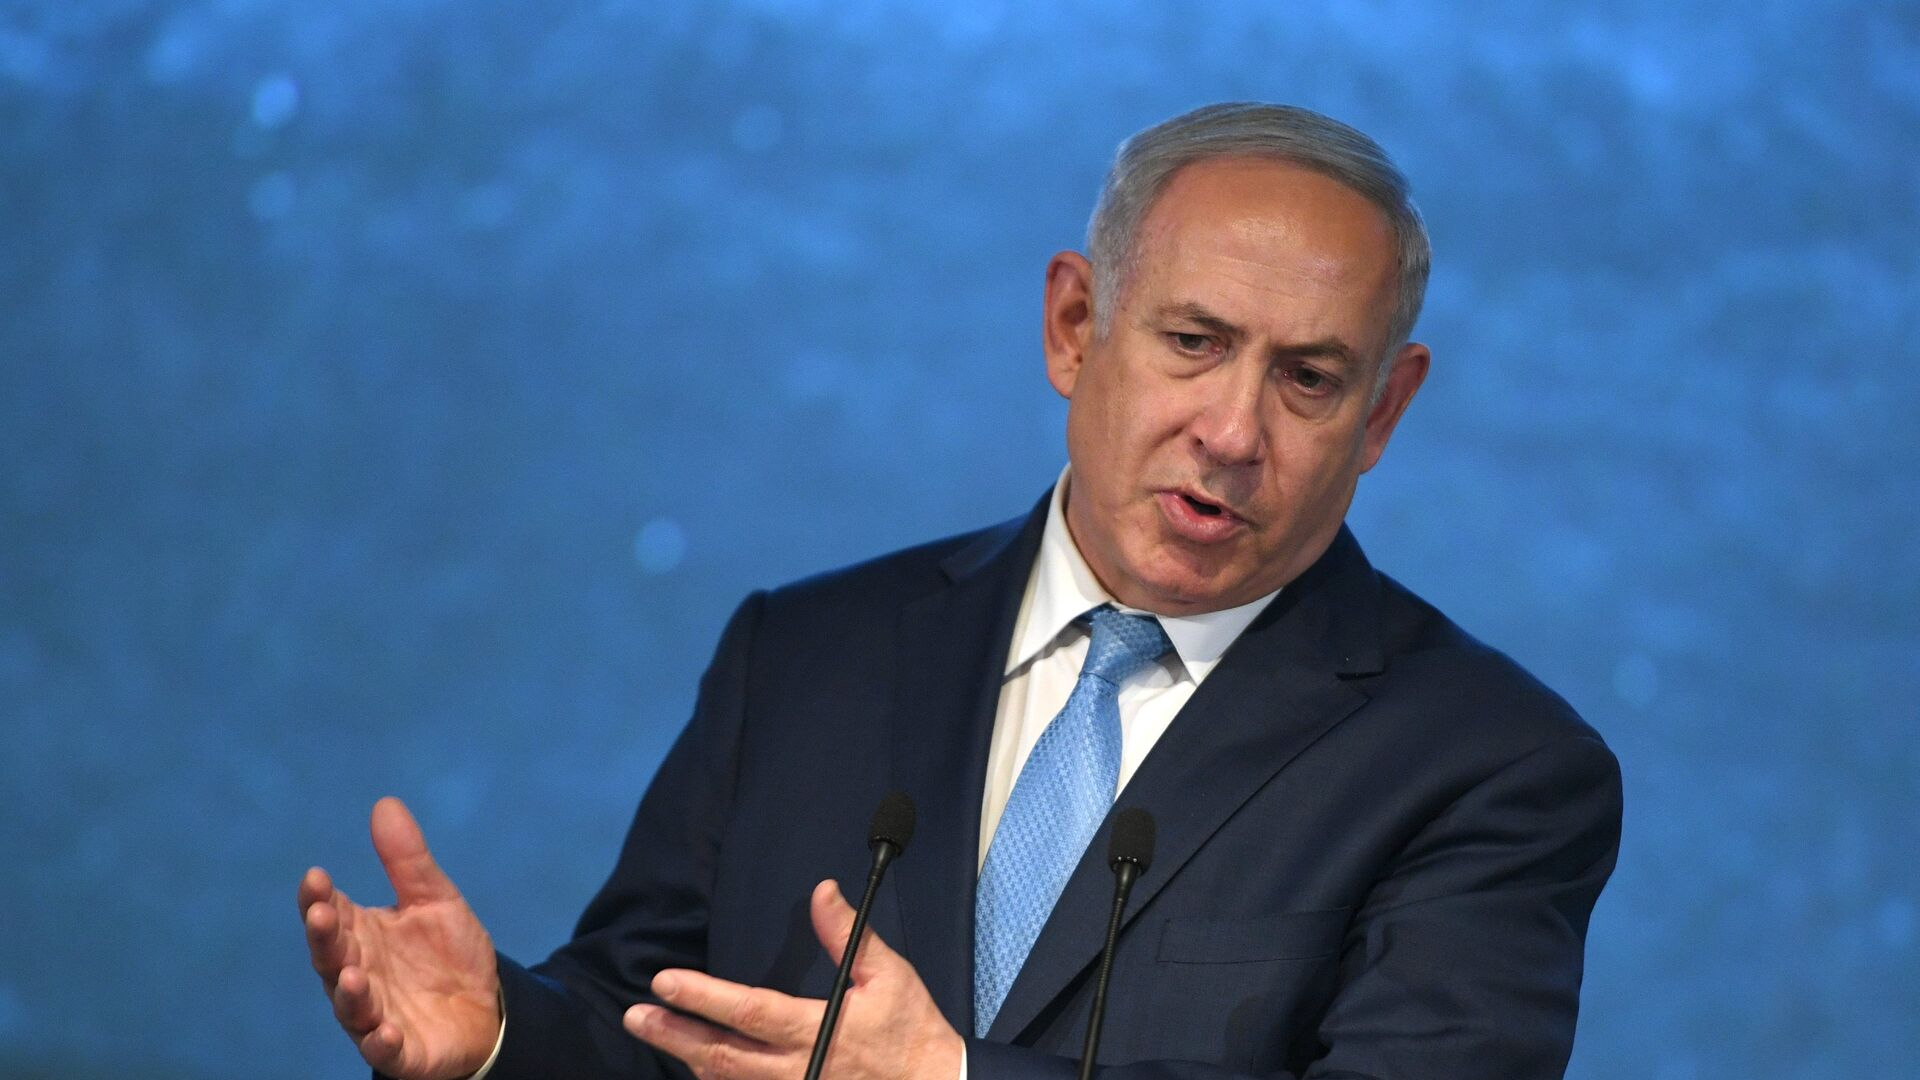 Benjamín Netanyahu, primer ministro de Israel - Sputnik Mundo, 1920, 02.05.2021